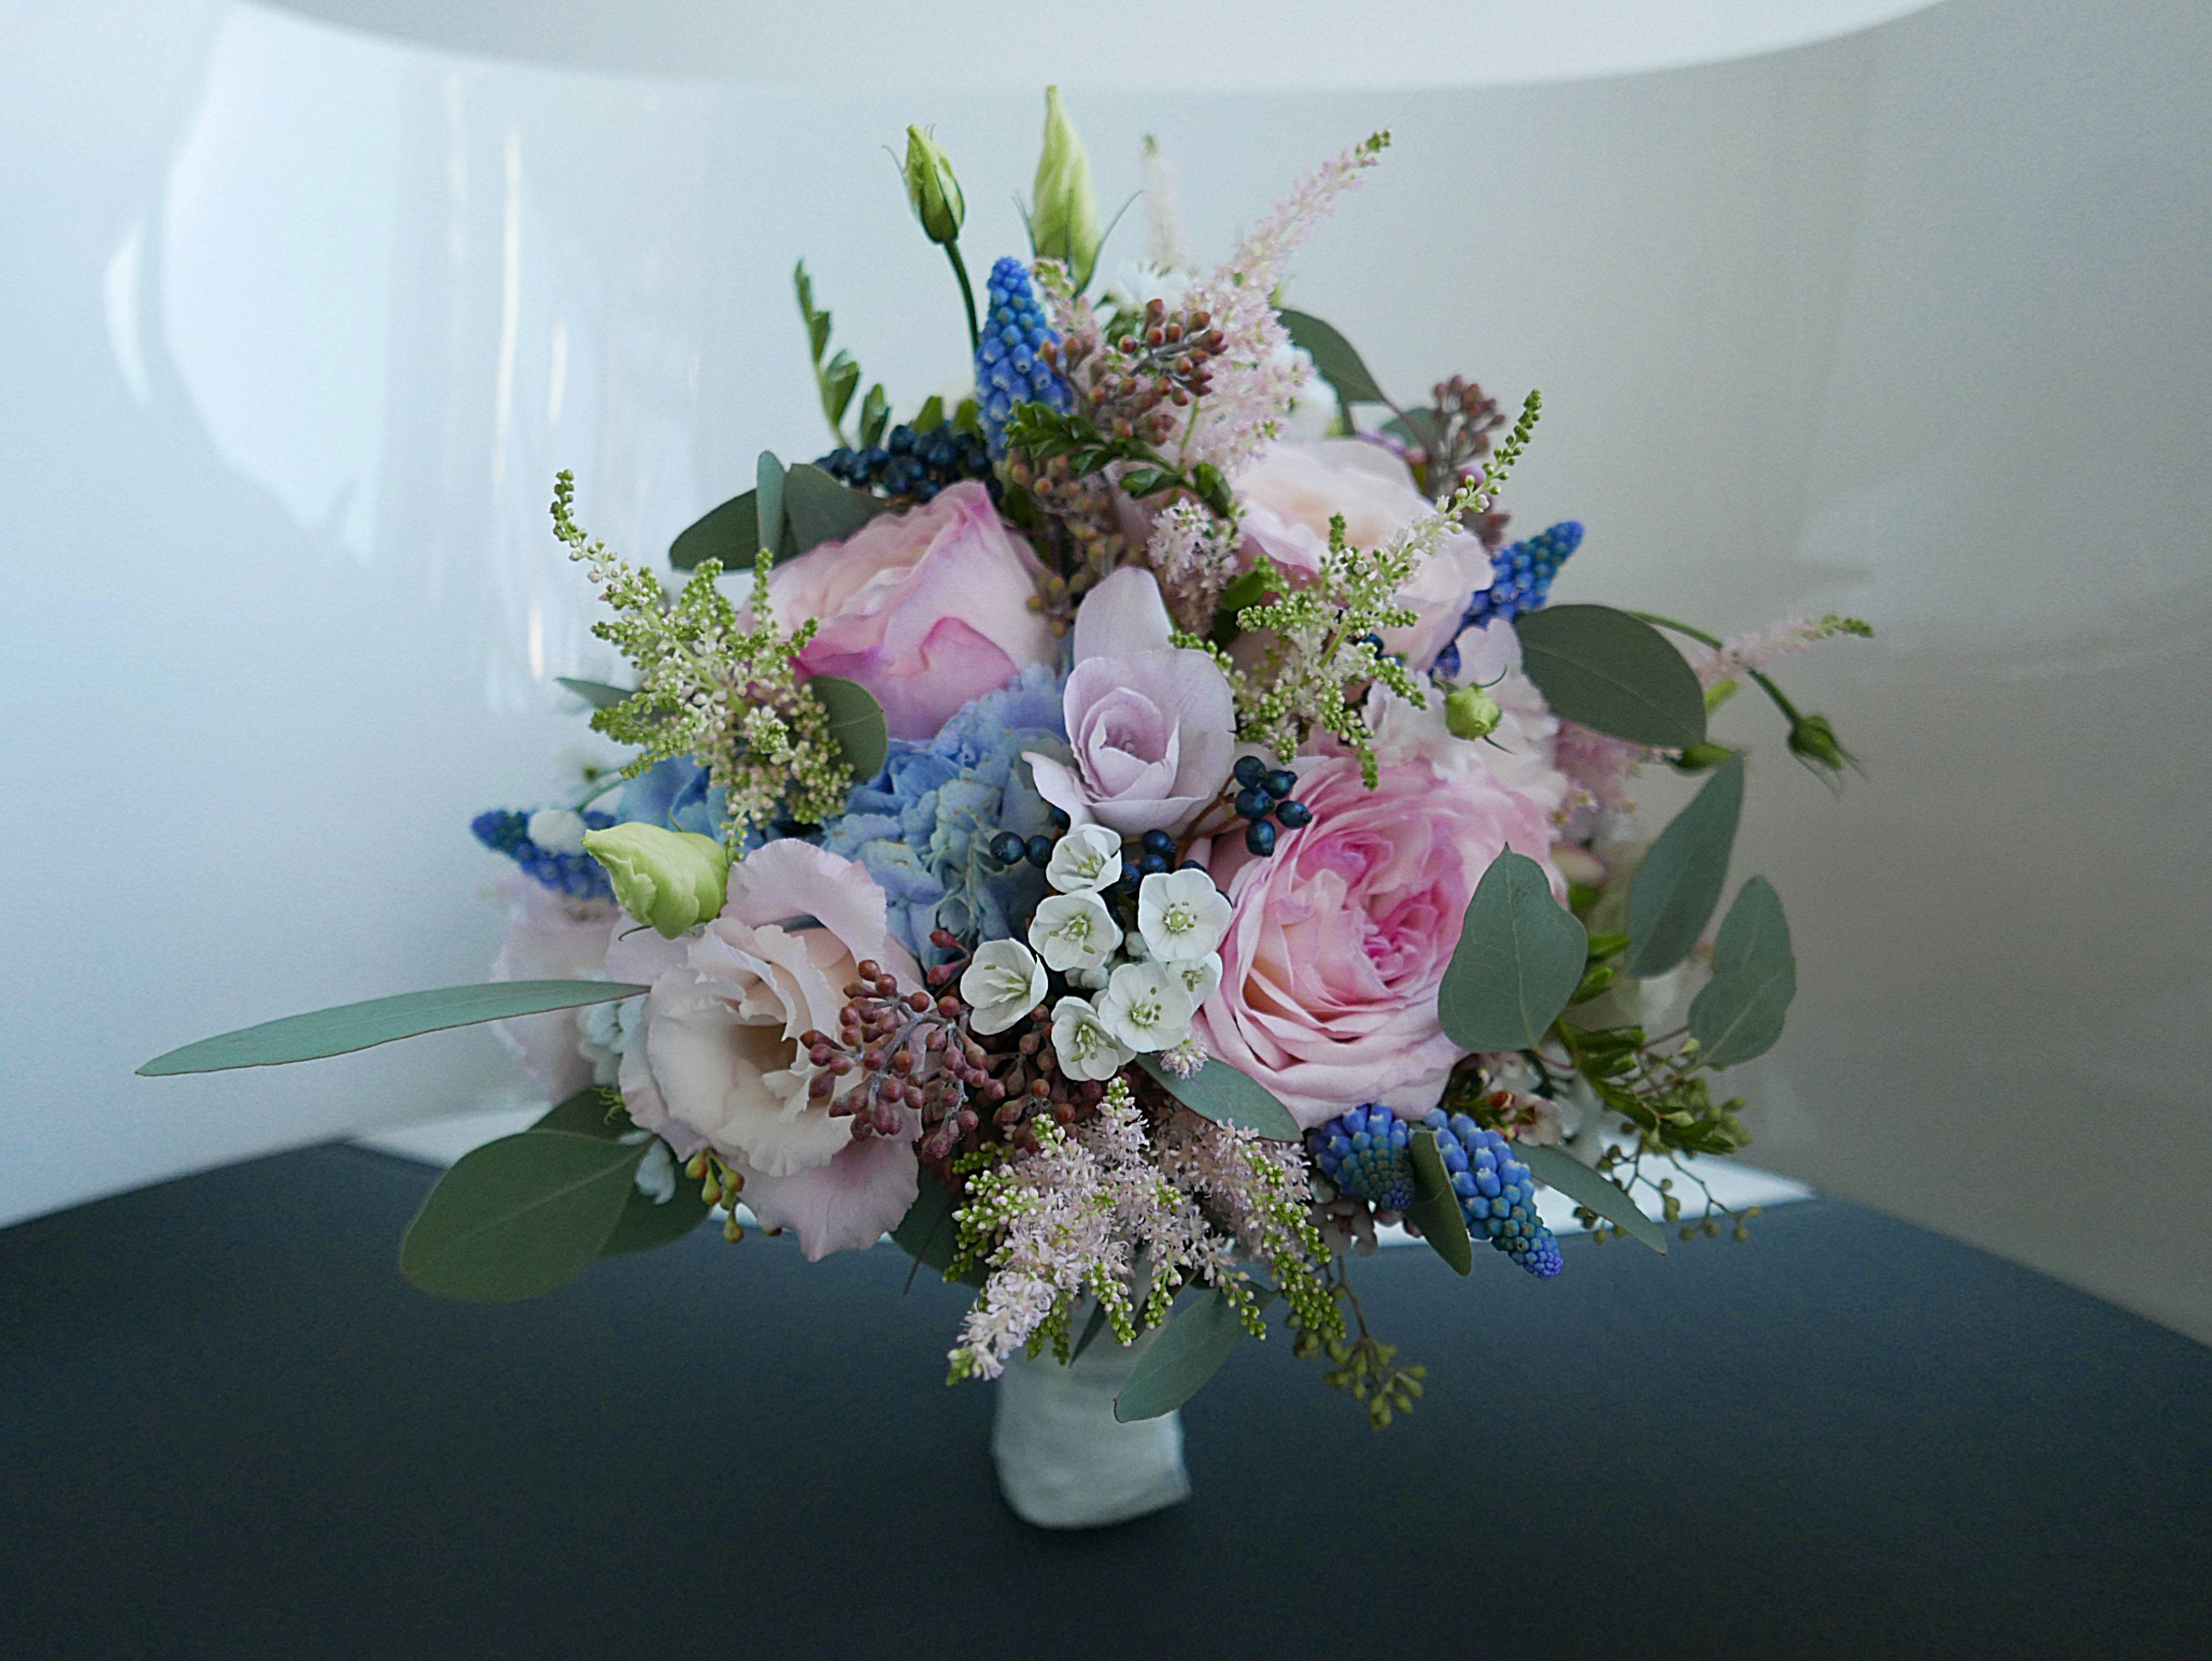 Brautstrauss Pastell Rose Blau Weiss Trendfarben 2016 Http Www